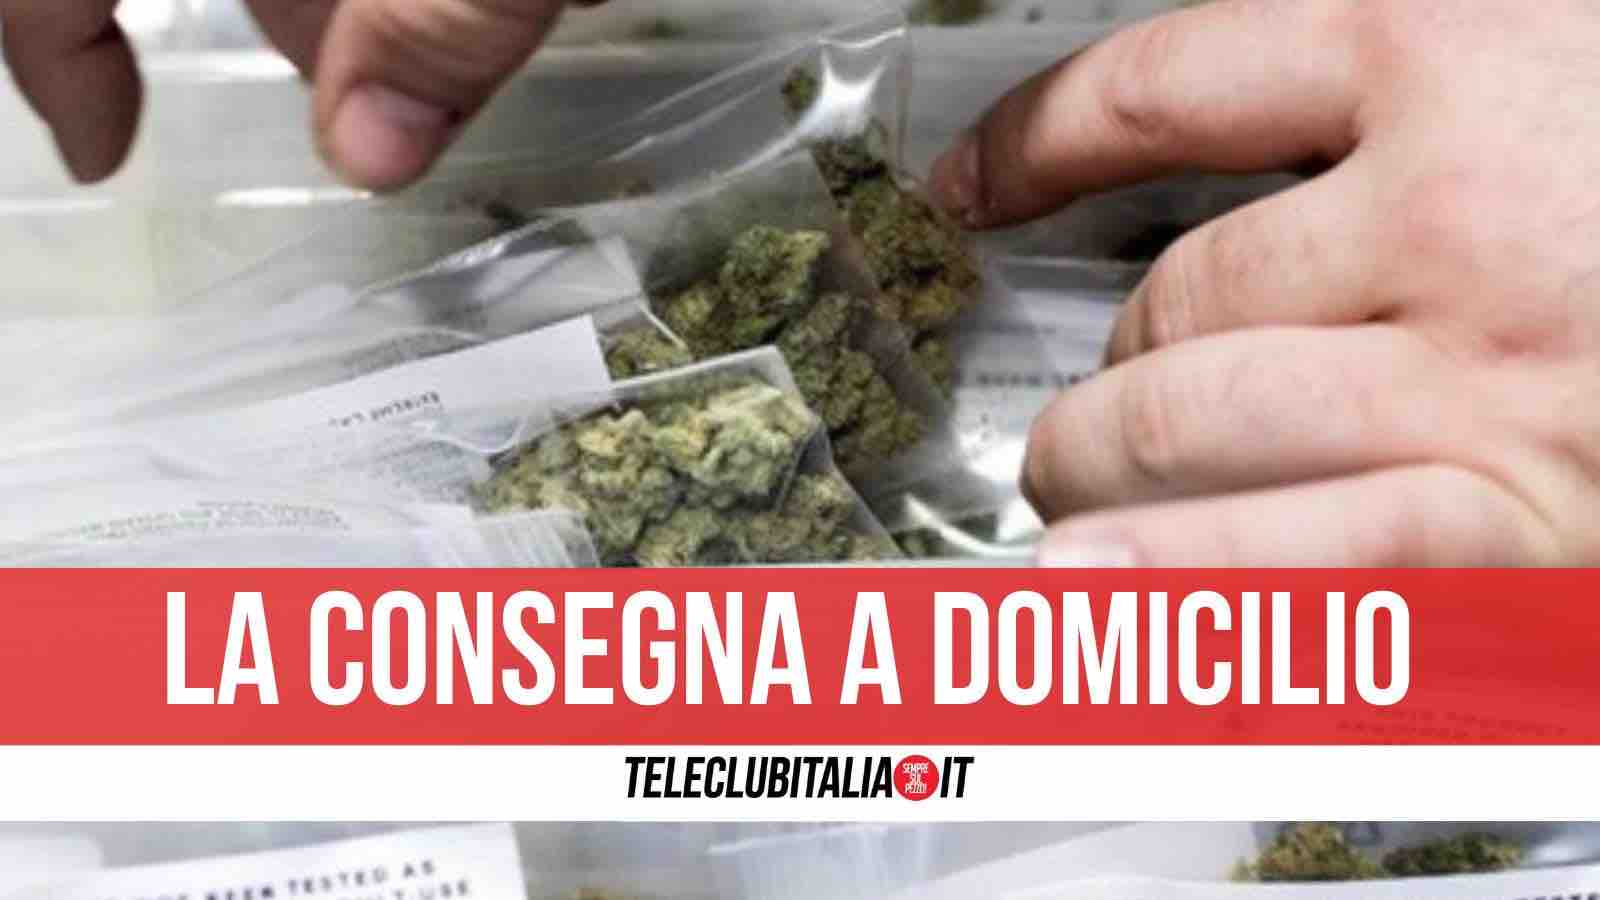 cannabis light di cittadinanza